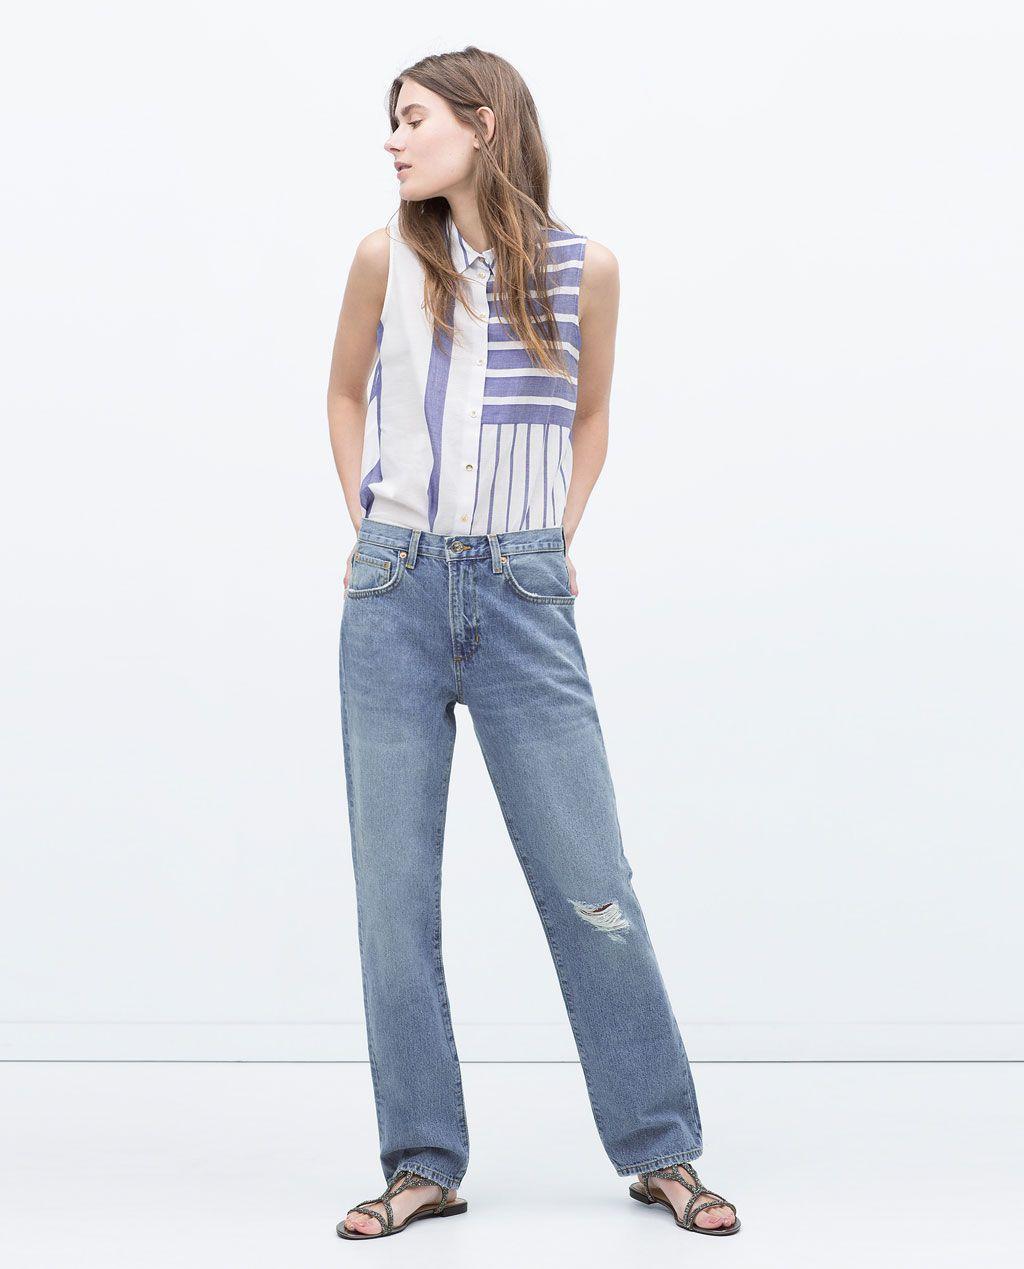 Zara sale striped shirt stuff to buy pinterest zara women